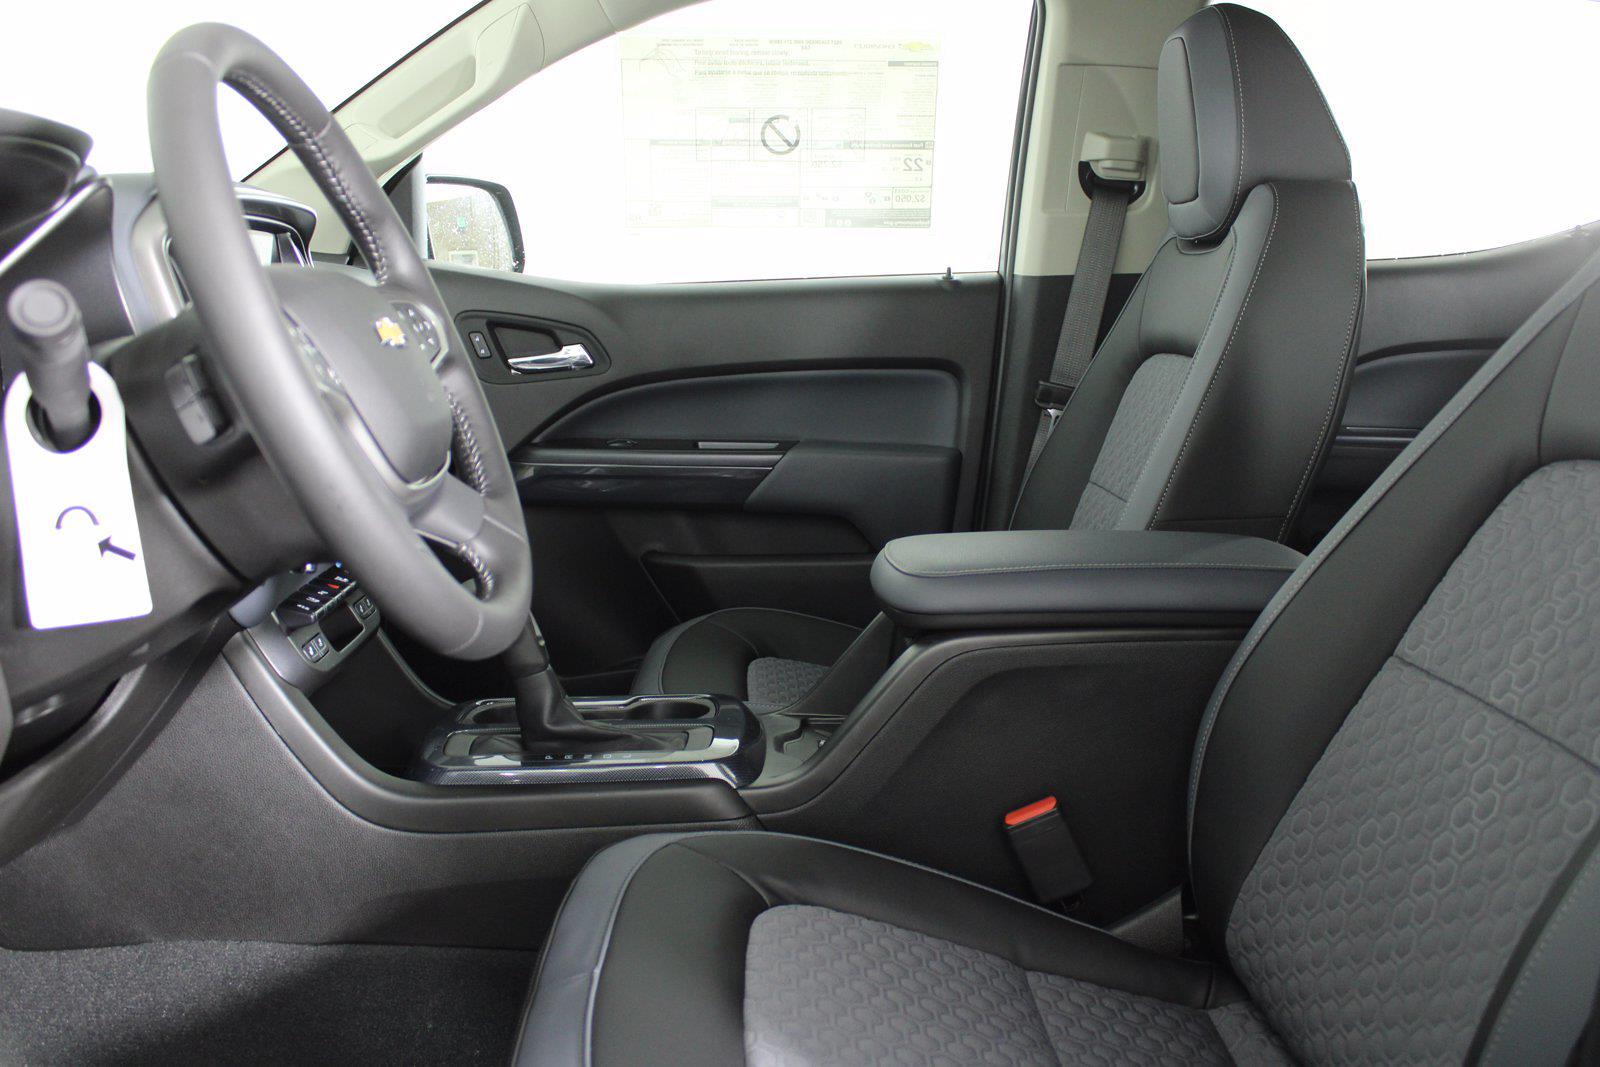 2021 Chevrolet Colorado Crew Cab 4x4, Pickup #D110340 - photo 14